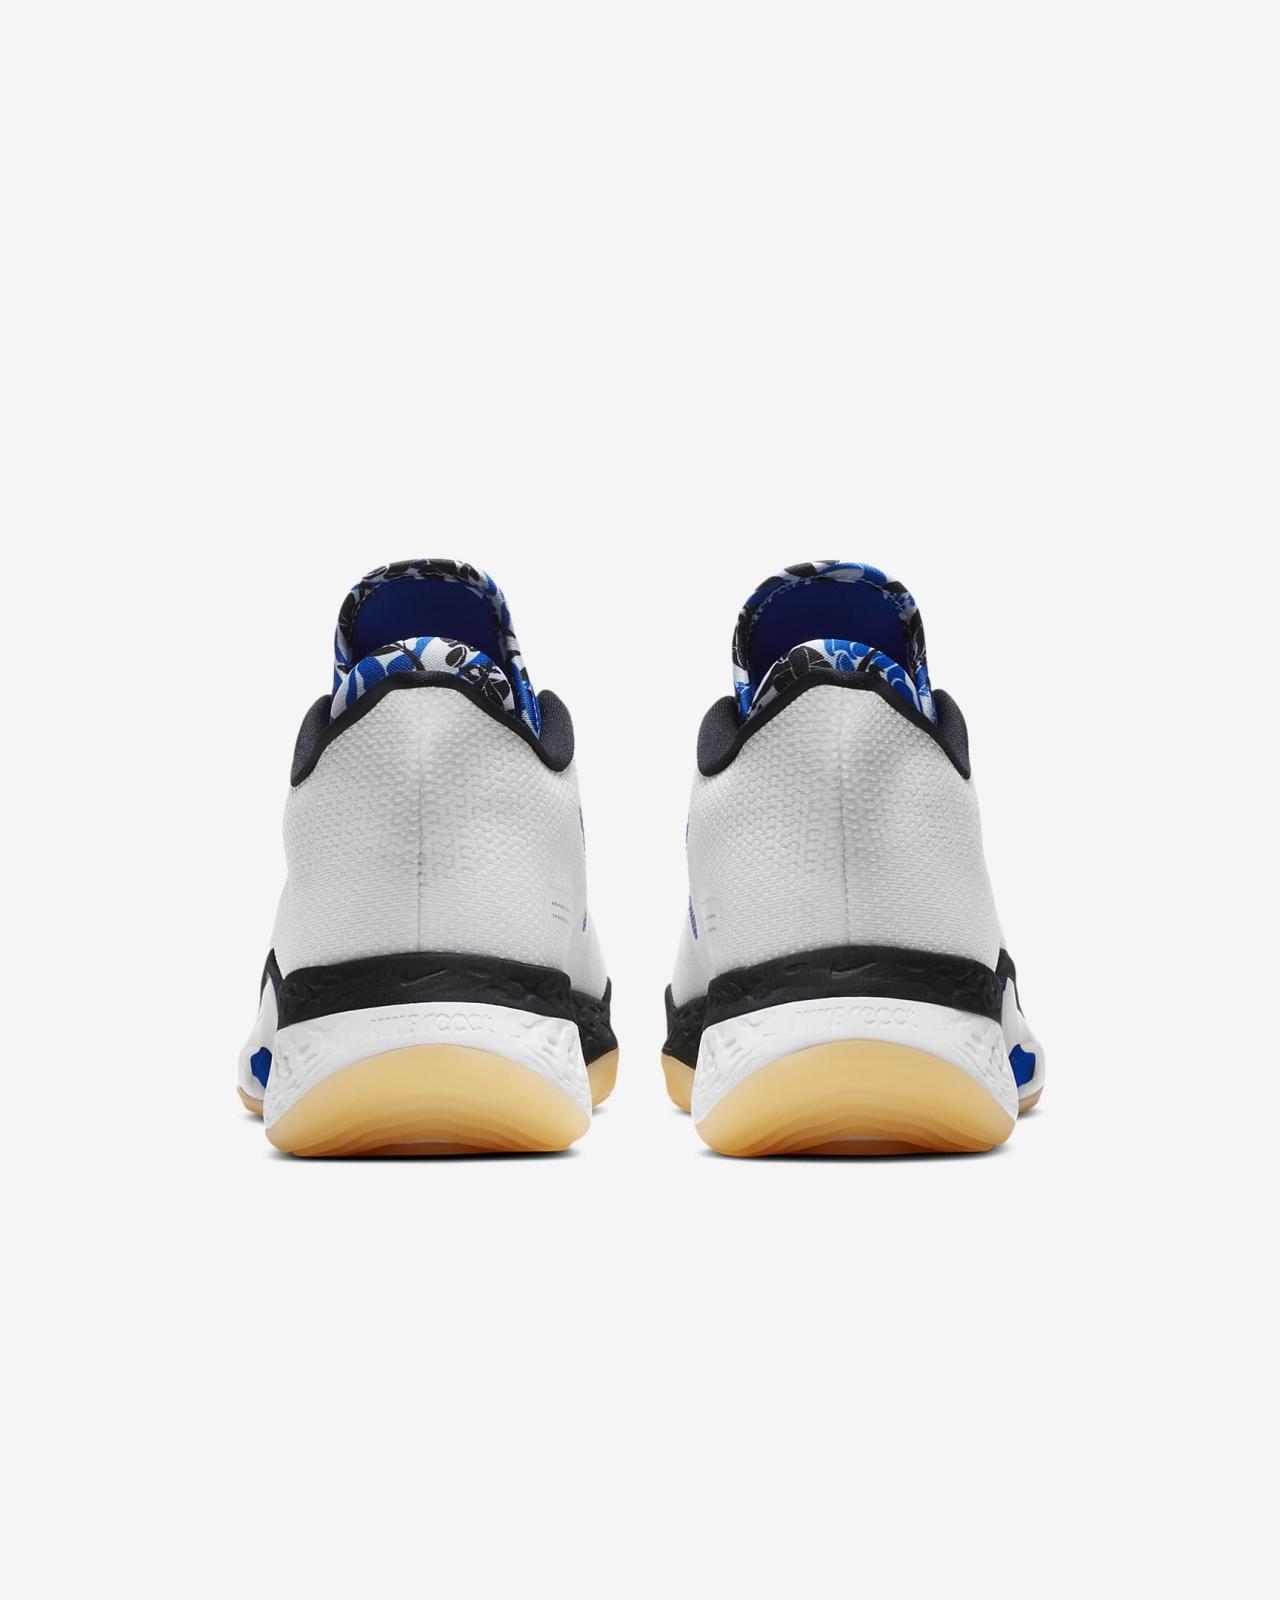 "Nike Basketball推出全新白/黑/浅甜瓜橙/皇家蓝色Air Zoom BB NXT EP ""Sisterhood"""